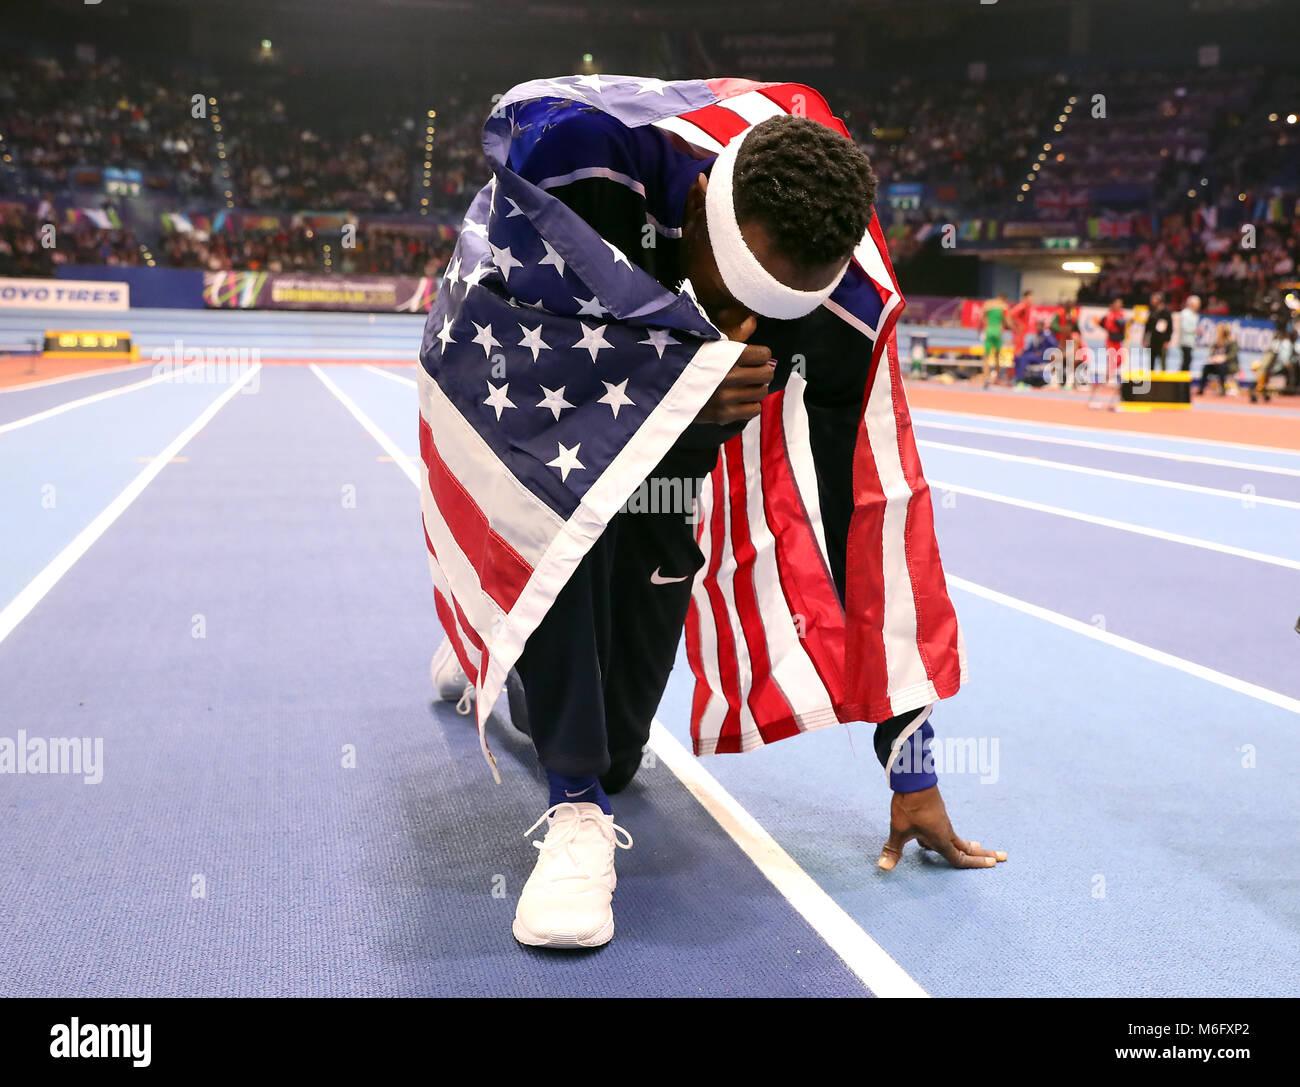 Die USA werden Aéroport feiert den Gewinn der Goldmedaille bei den Herren Dreisprung Finale bei Tag drei der Stockbild